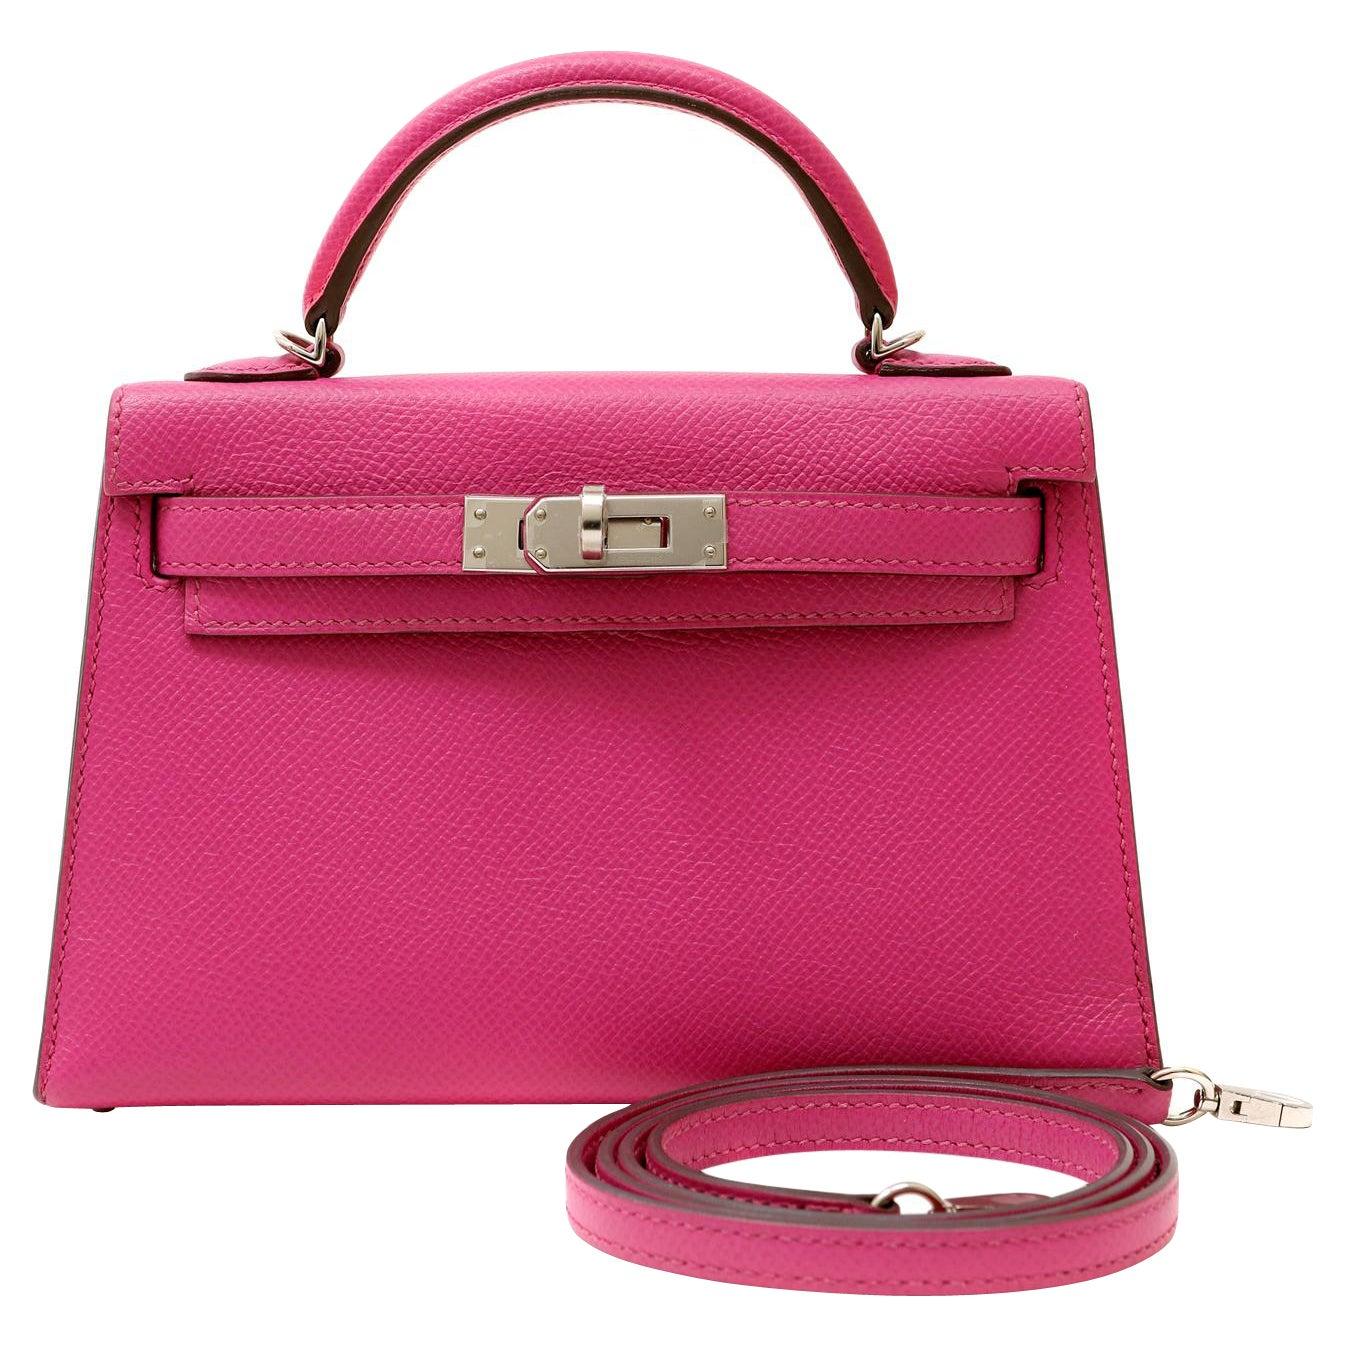 Hermès Shocking Pink Epsom Mini 20 cm Kelly Bag